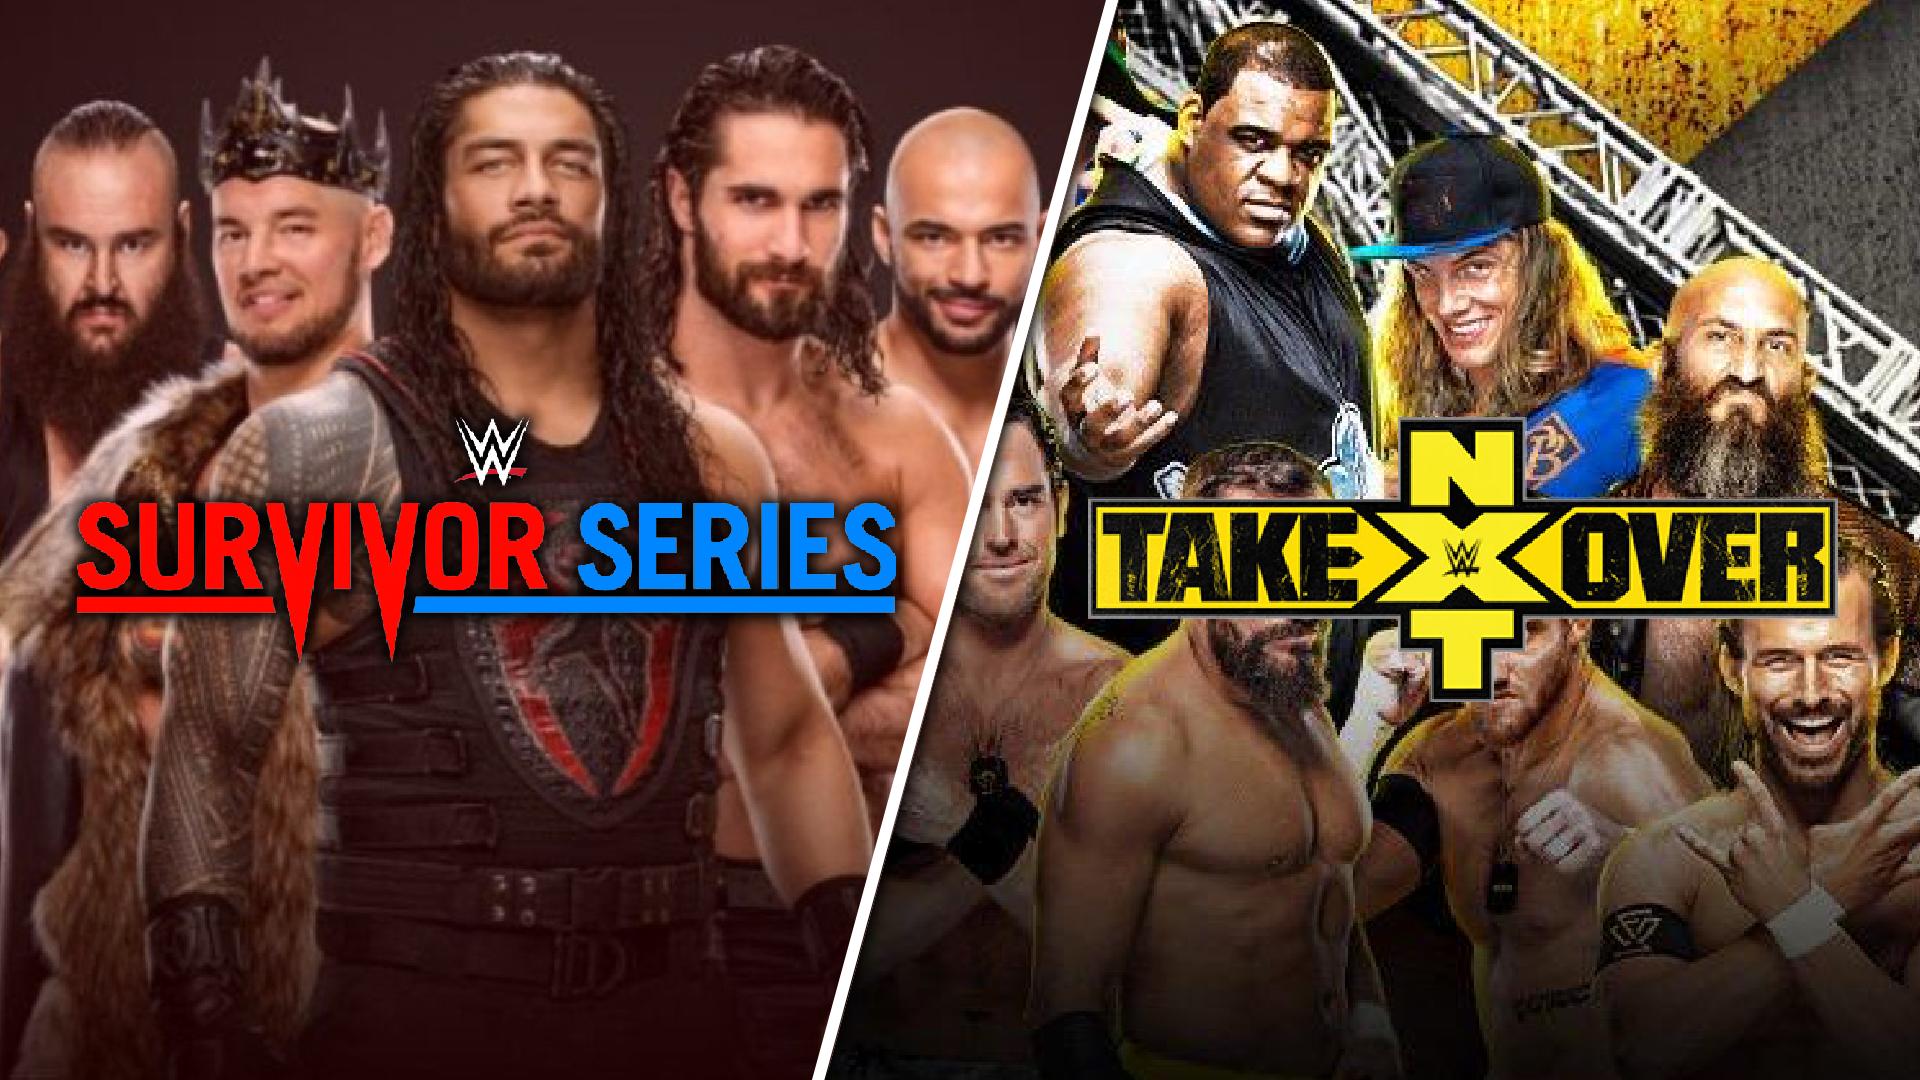 WWE Survivor Series & NXT TakeOver: WarGames 2019 Preview screen capture